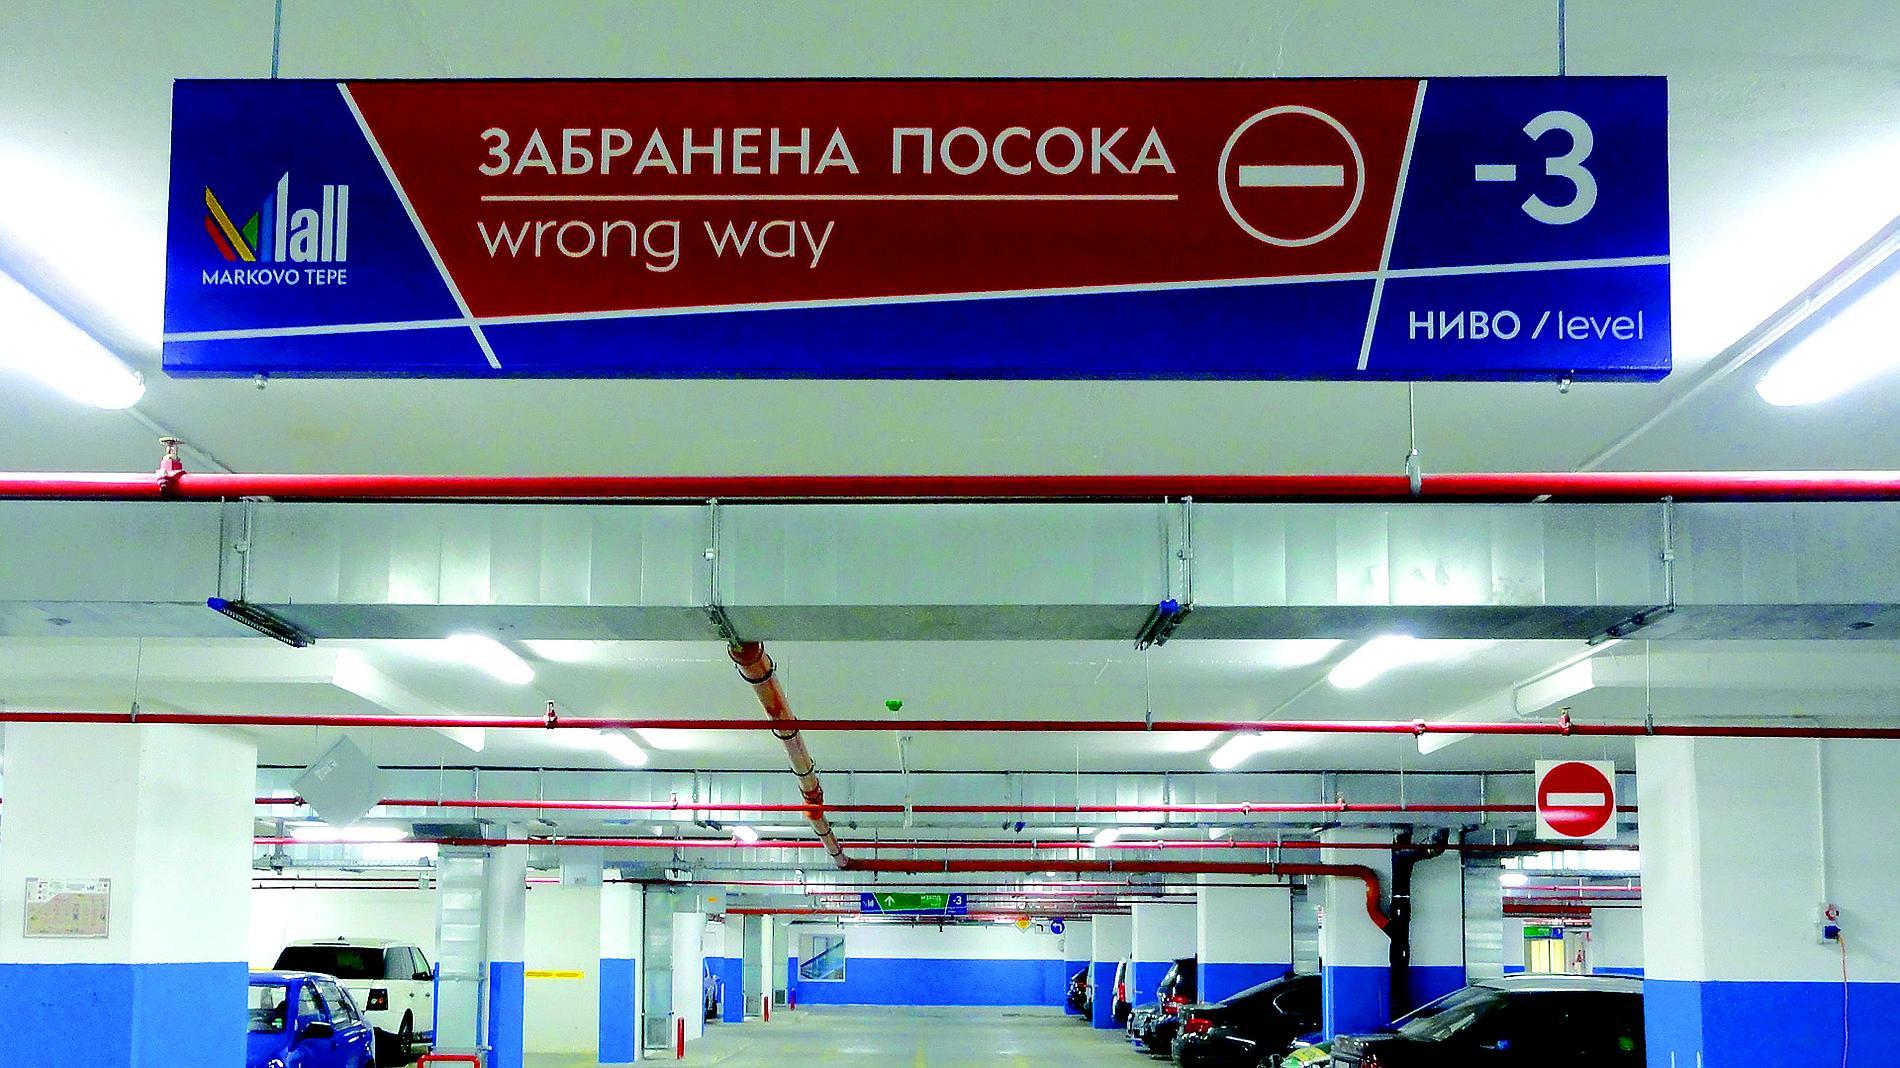 Mall Markovo Tepe - navigation parking signs